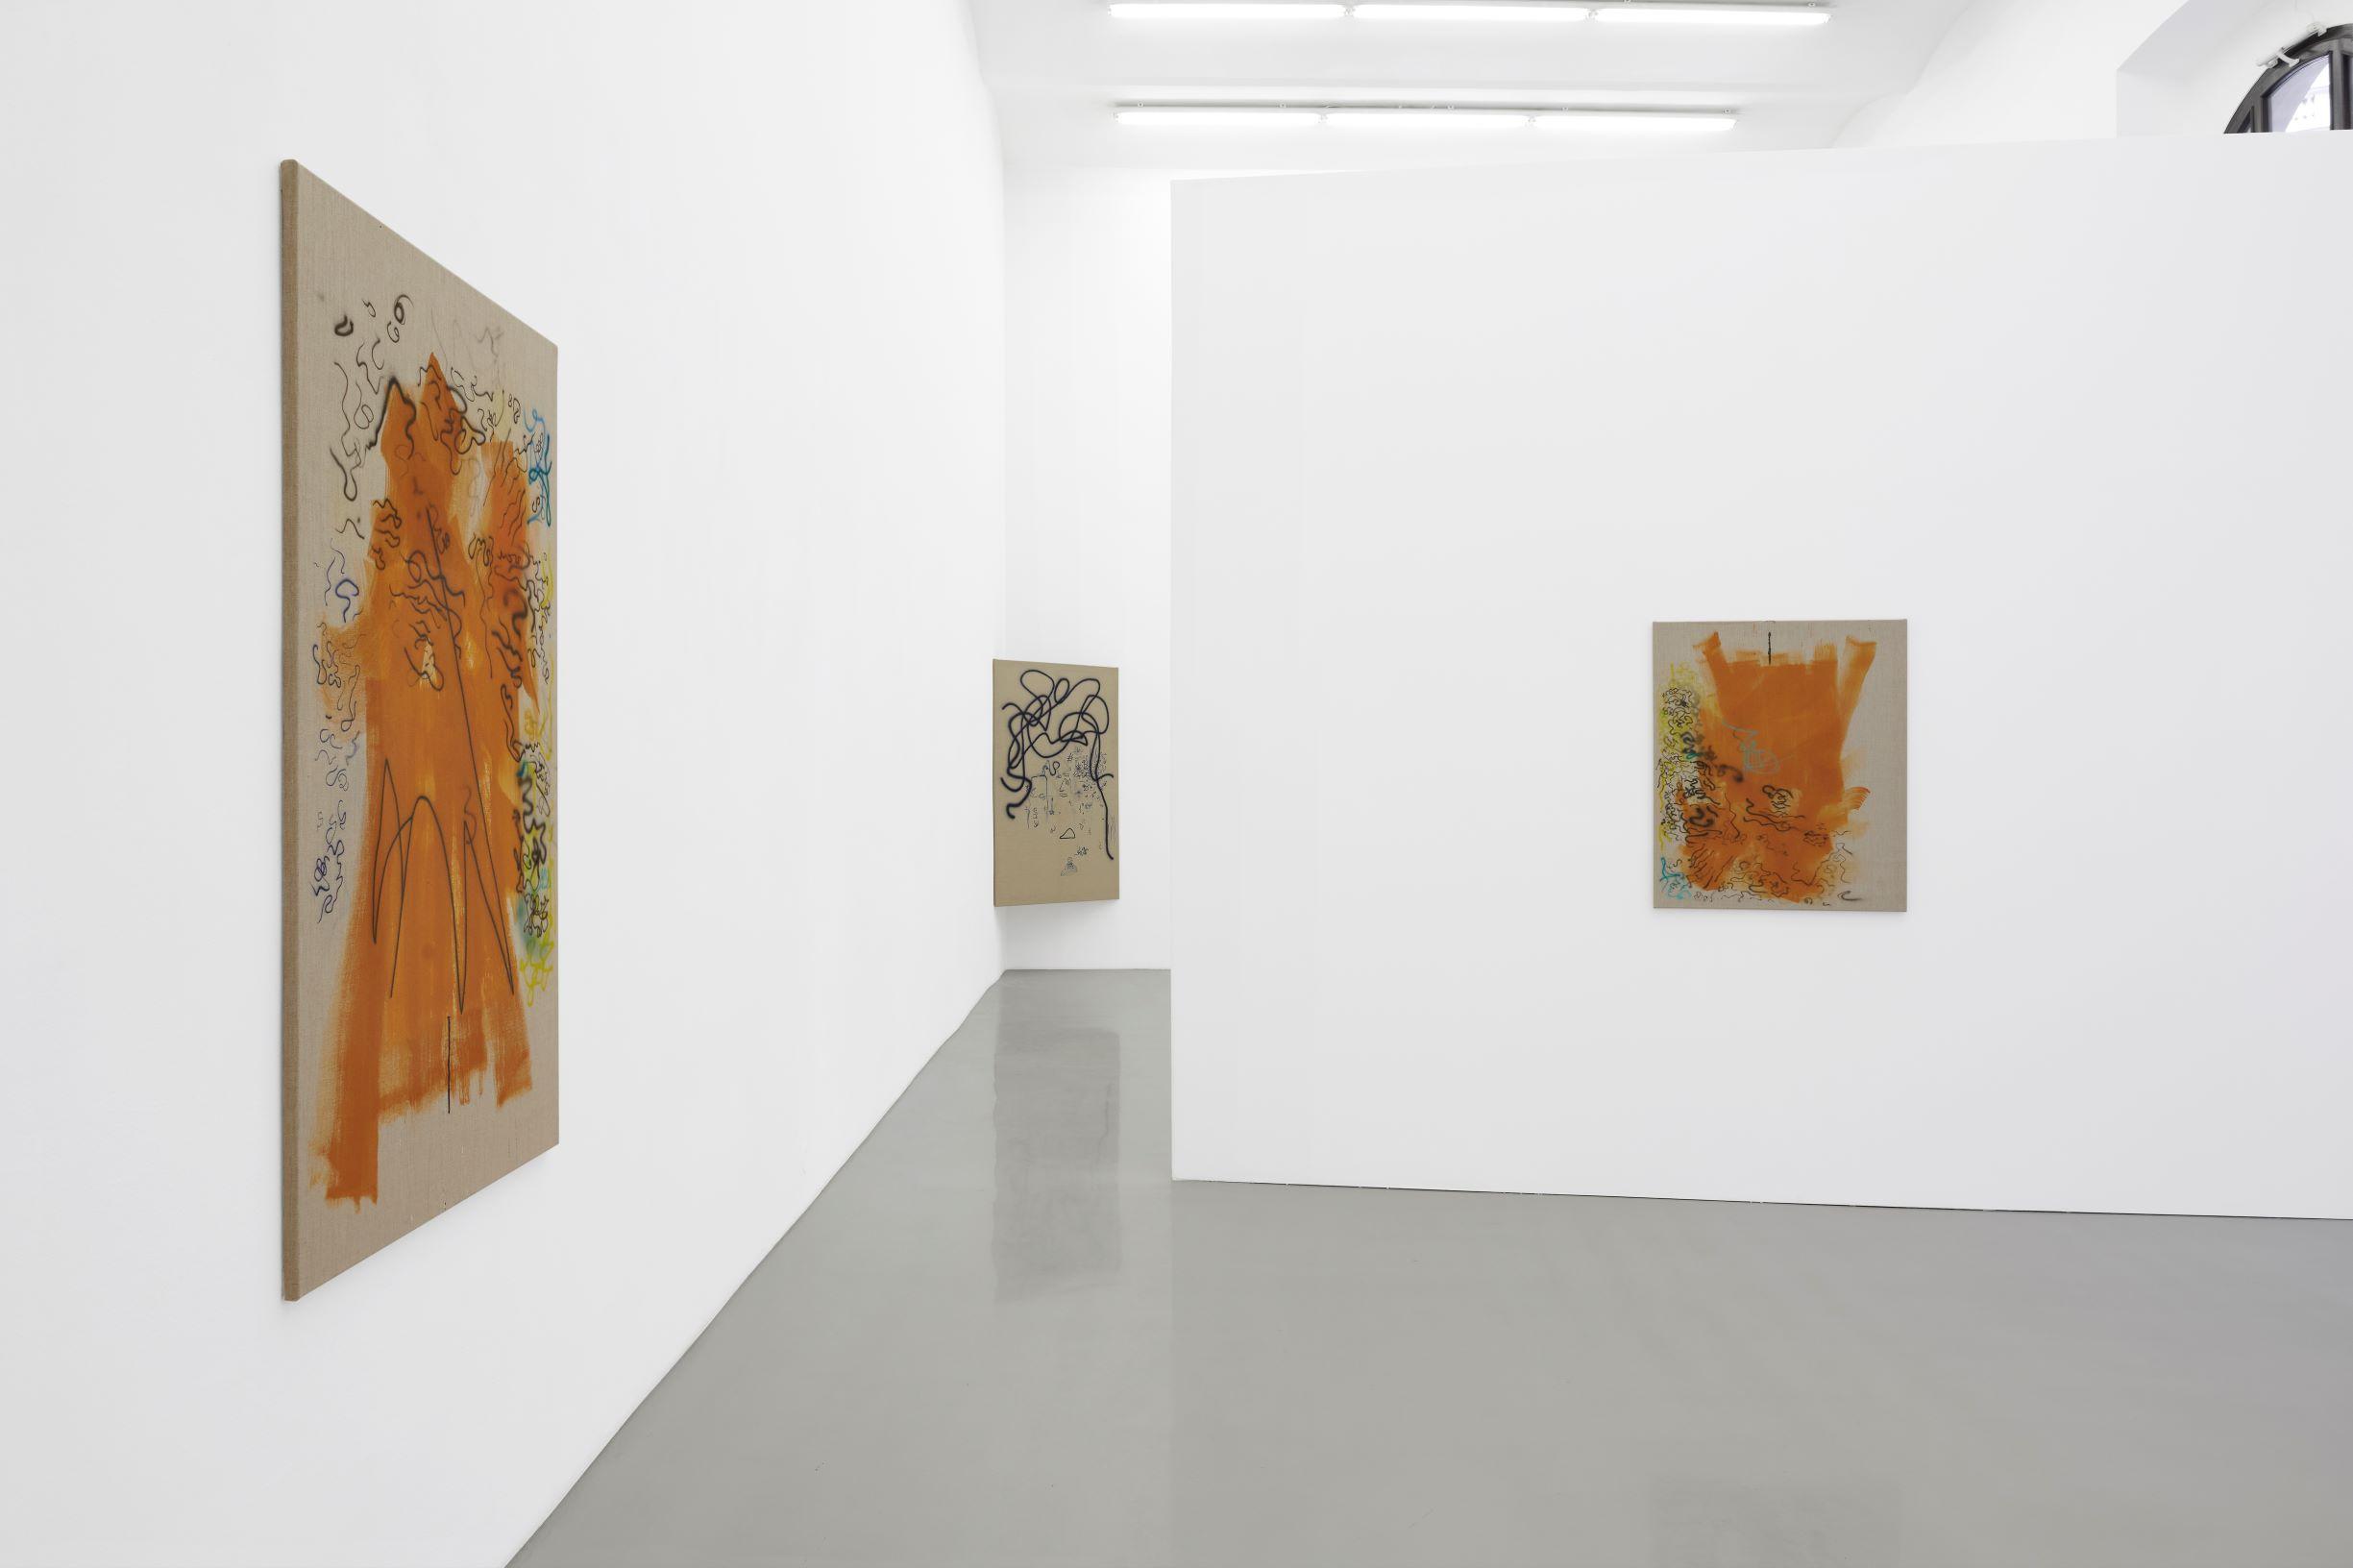 Julia Haller, Knights, Installation view images by Marcel Koehler, Galerie Meyek Kainer, 2020